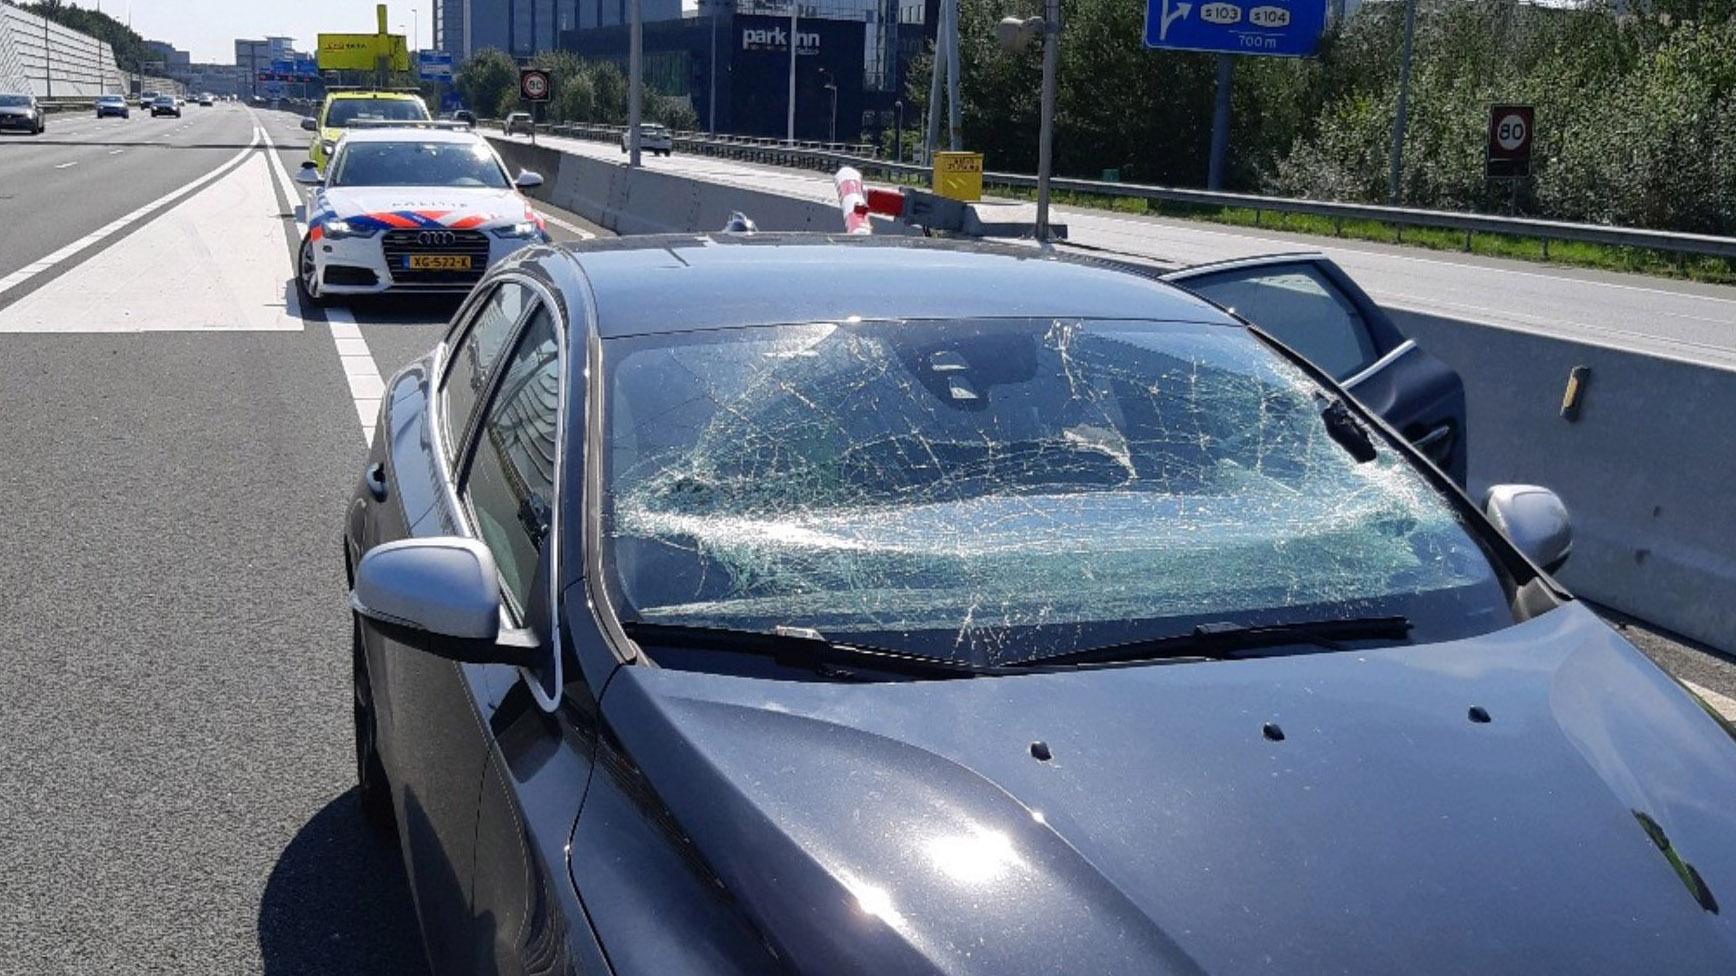 Volvo-rijder ramt slagboom vanwege navigatie crash voorruit slagboom